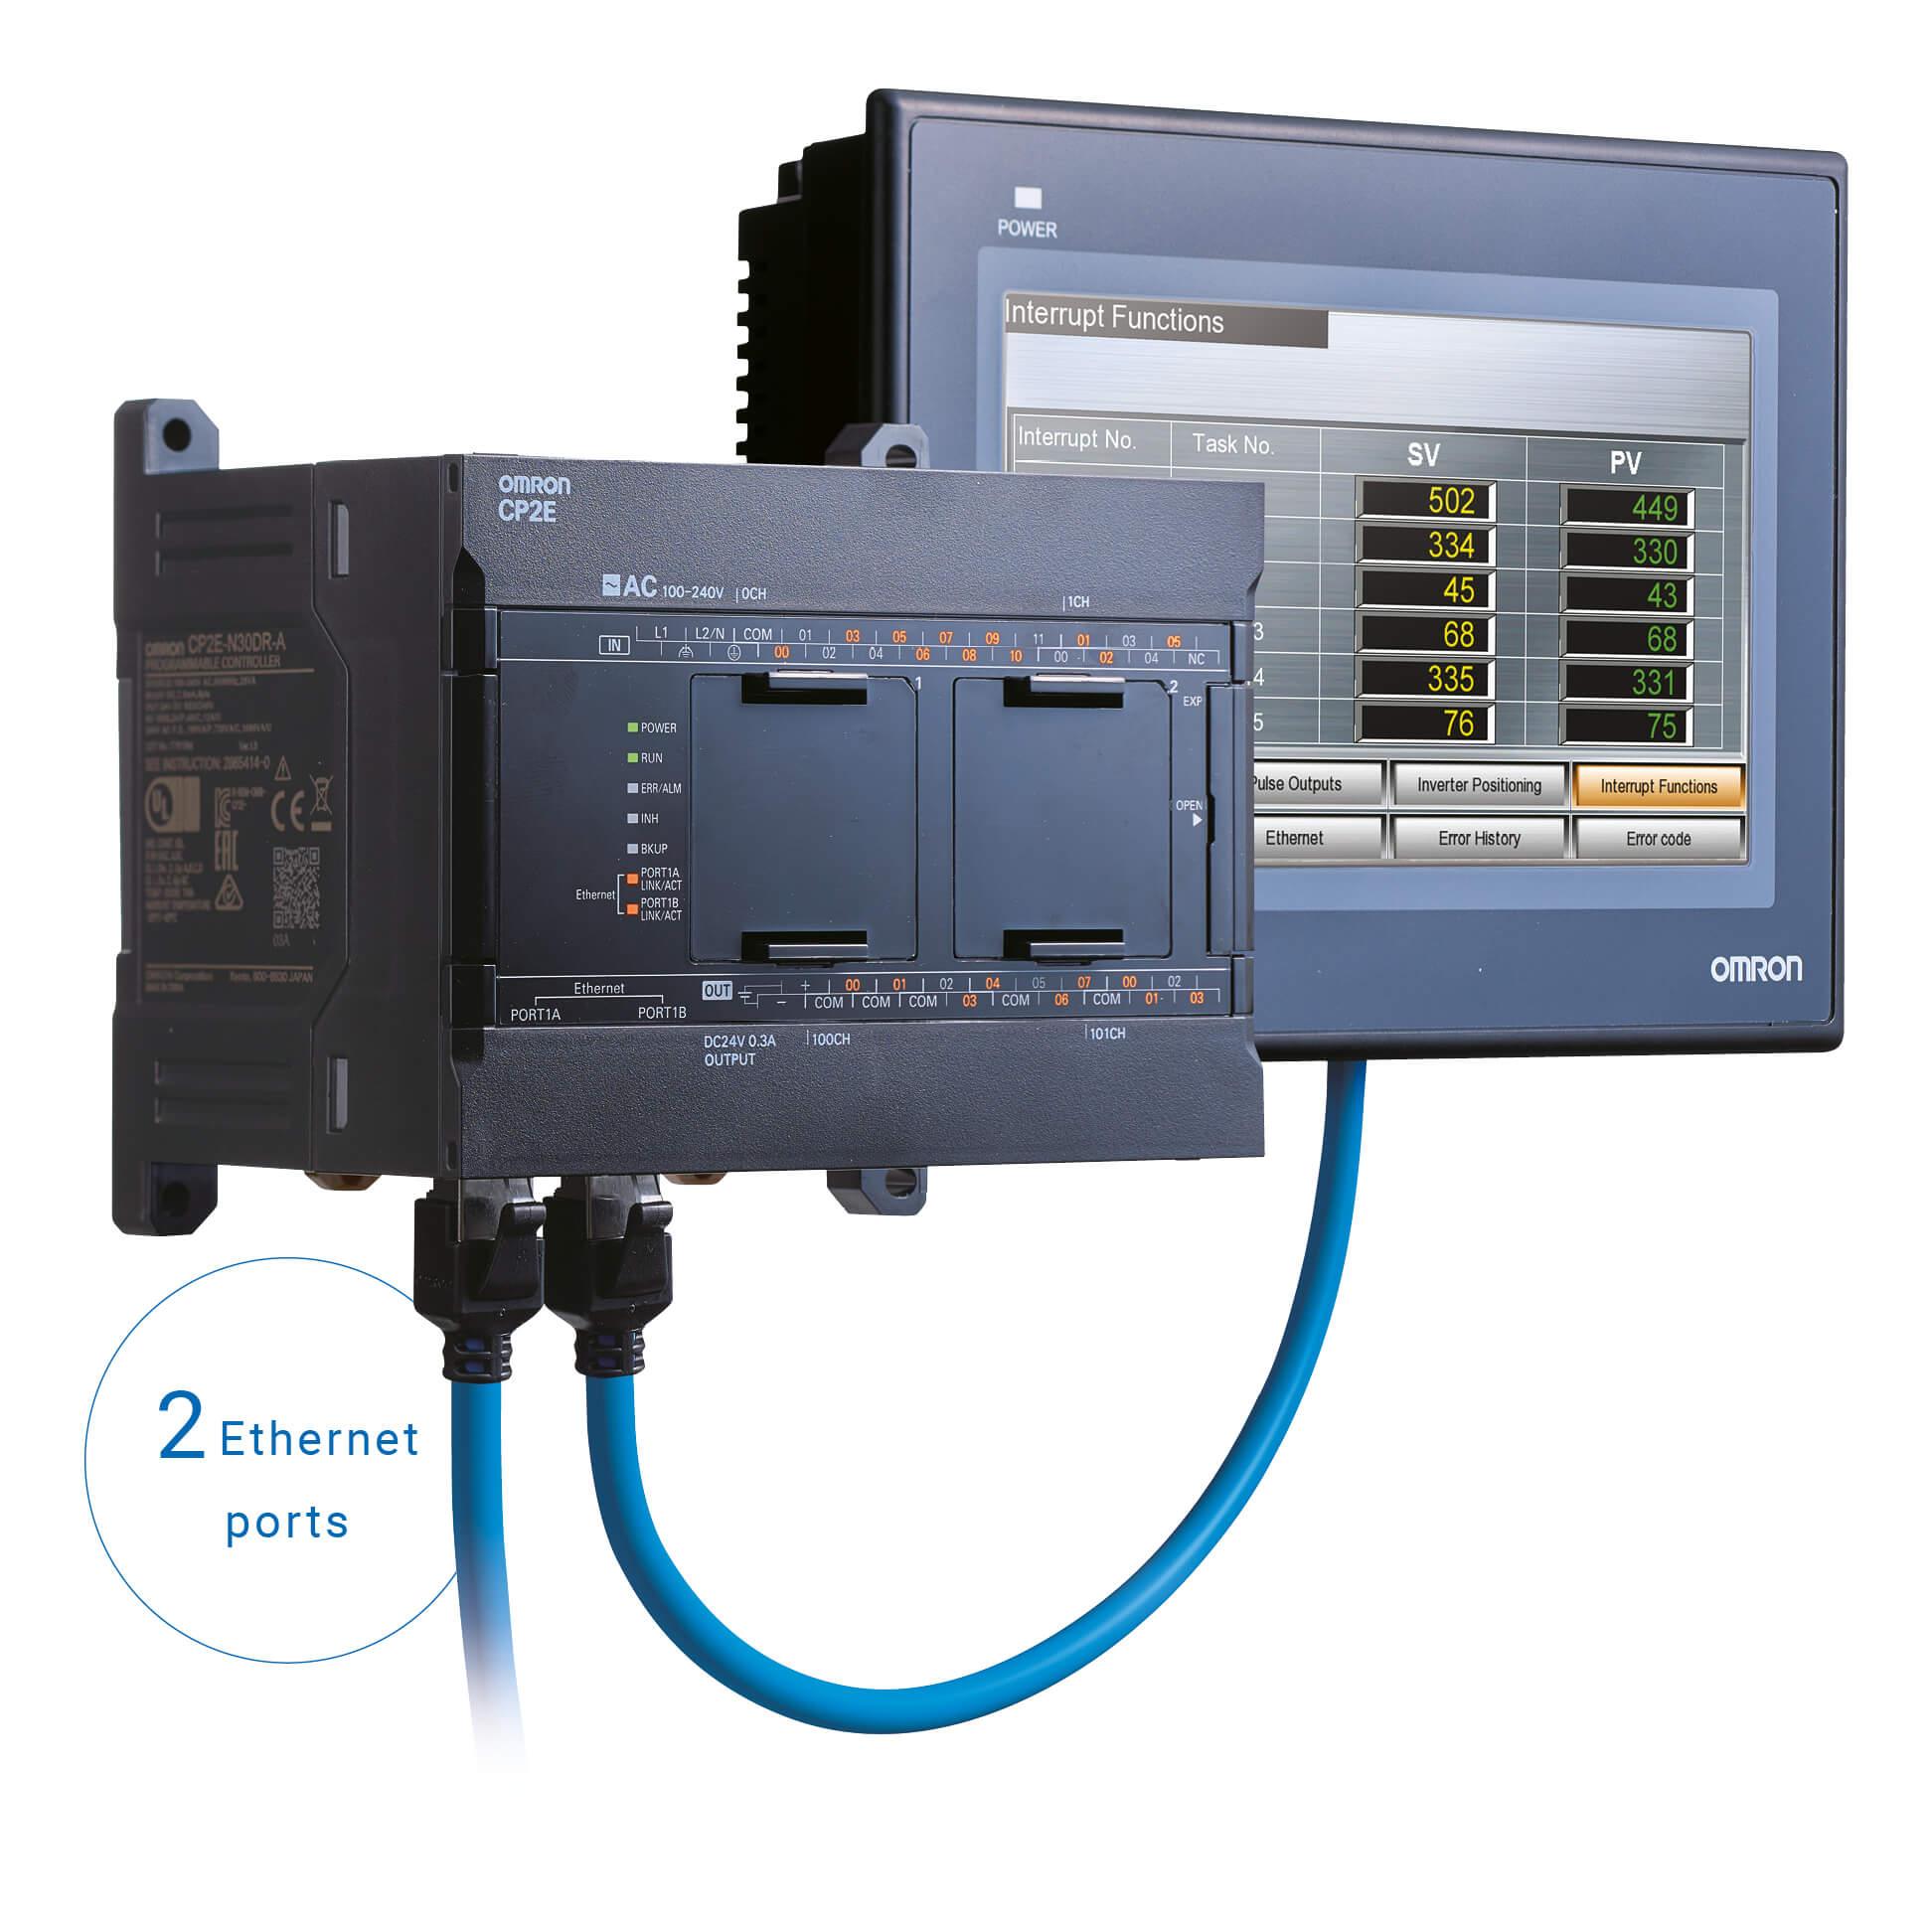 cp2e 2 ethernet ports en prod